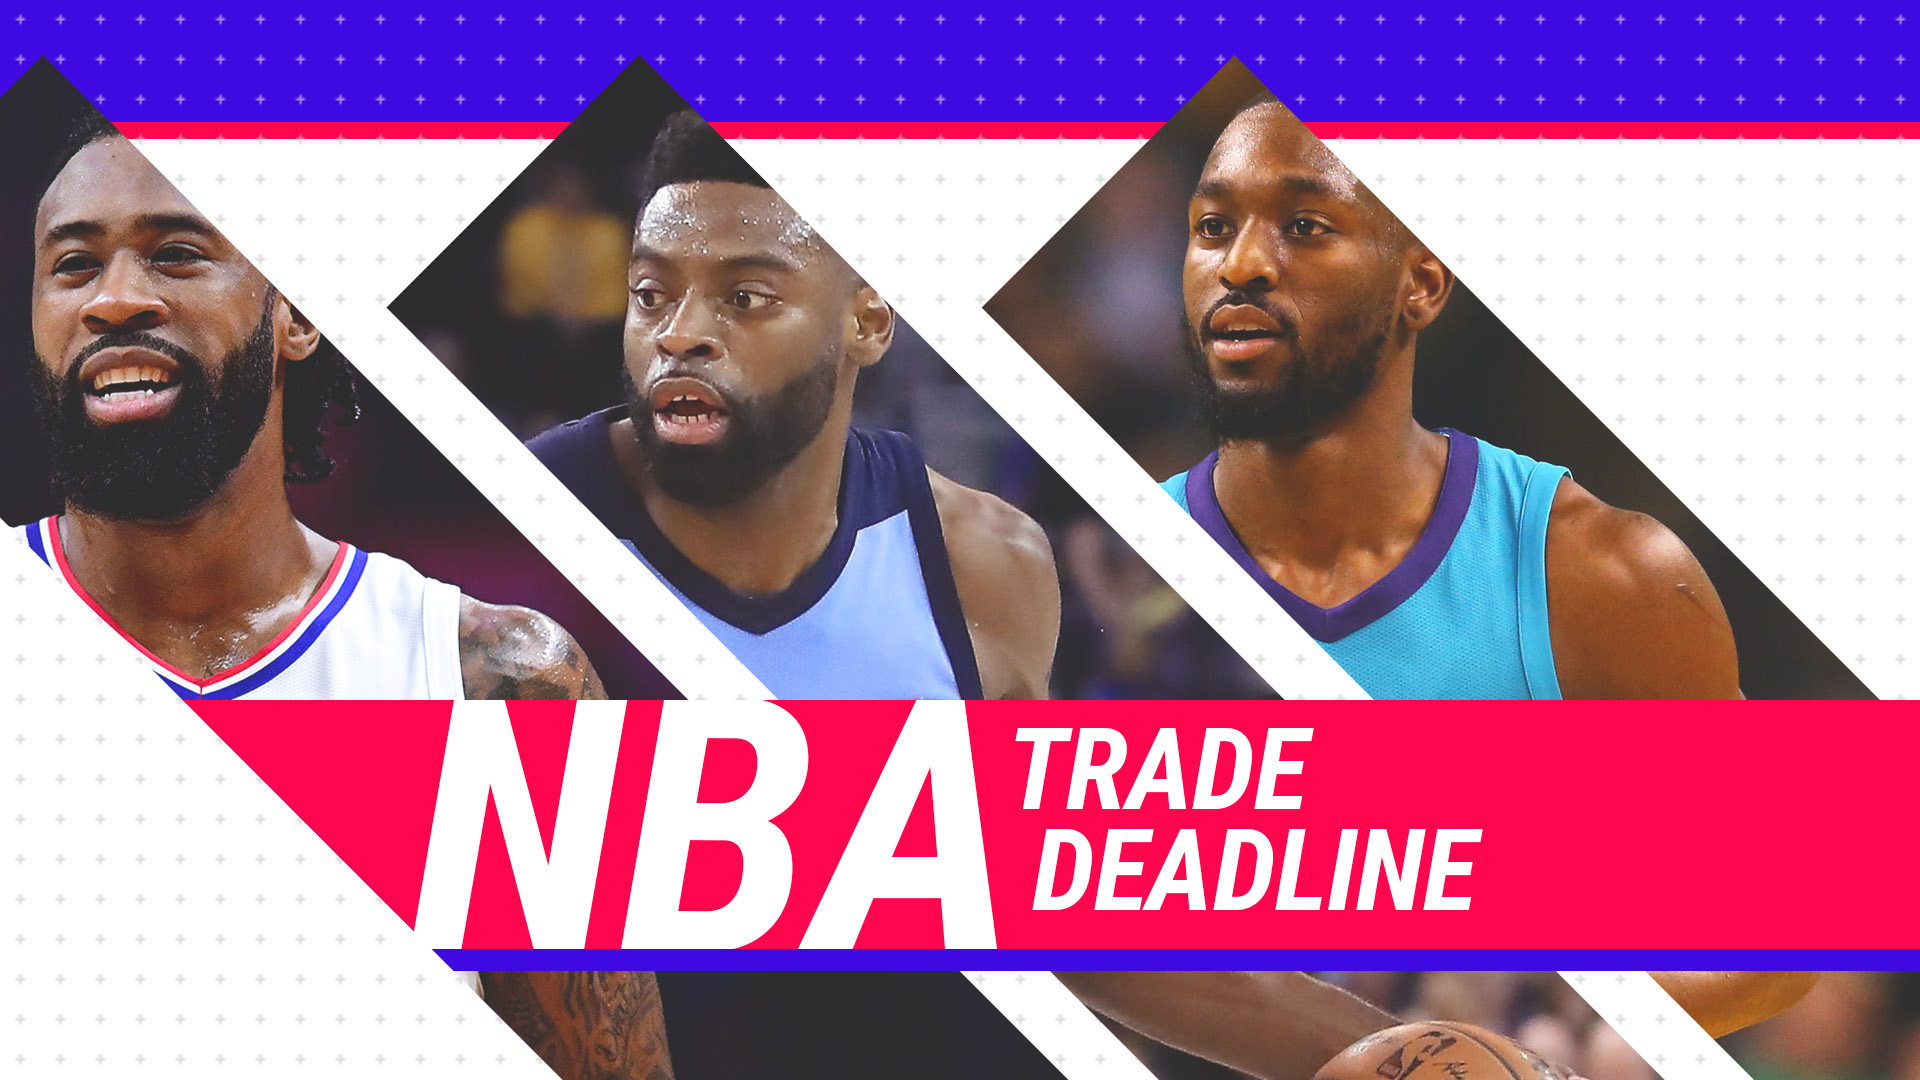 Trade Deadline Nba